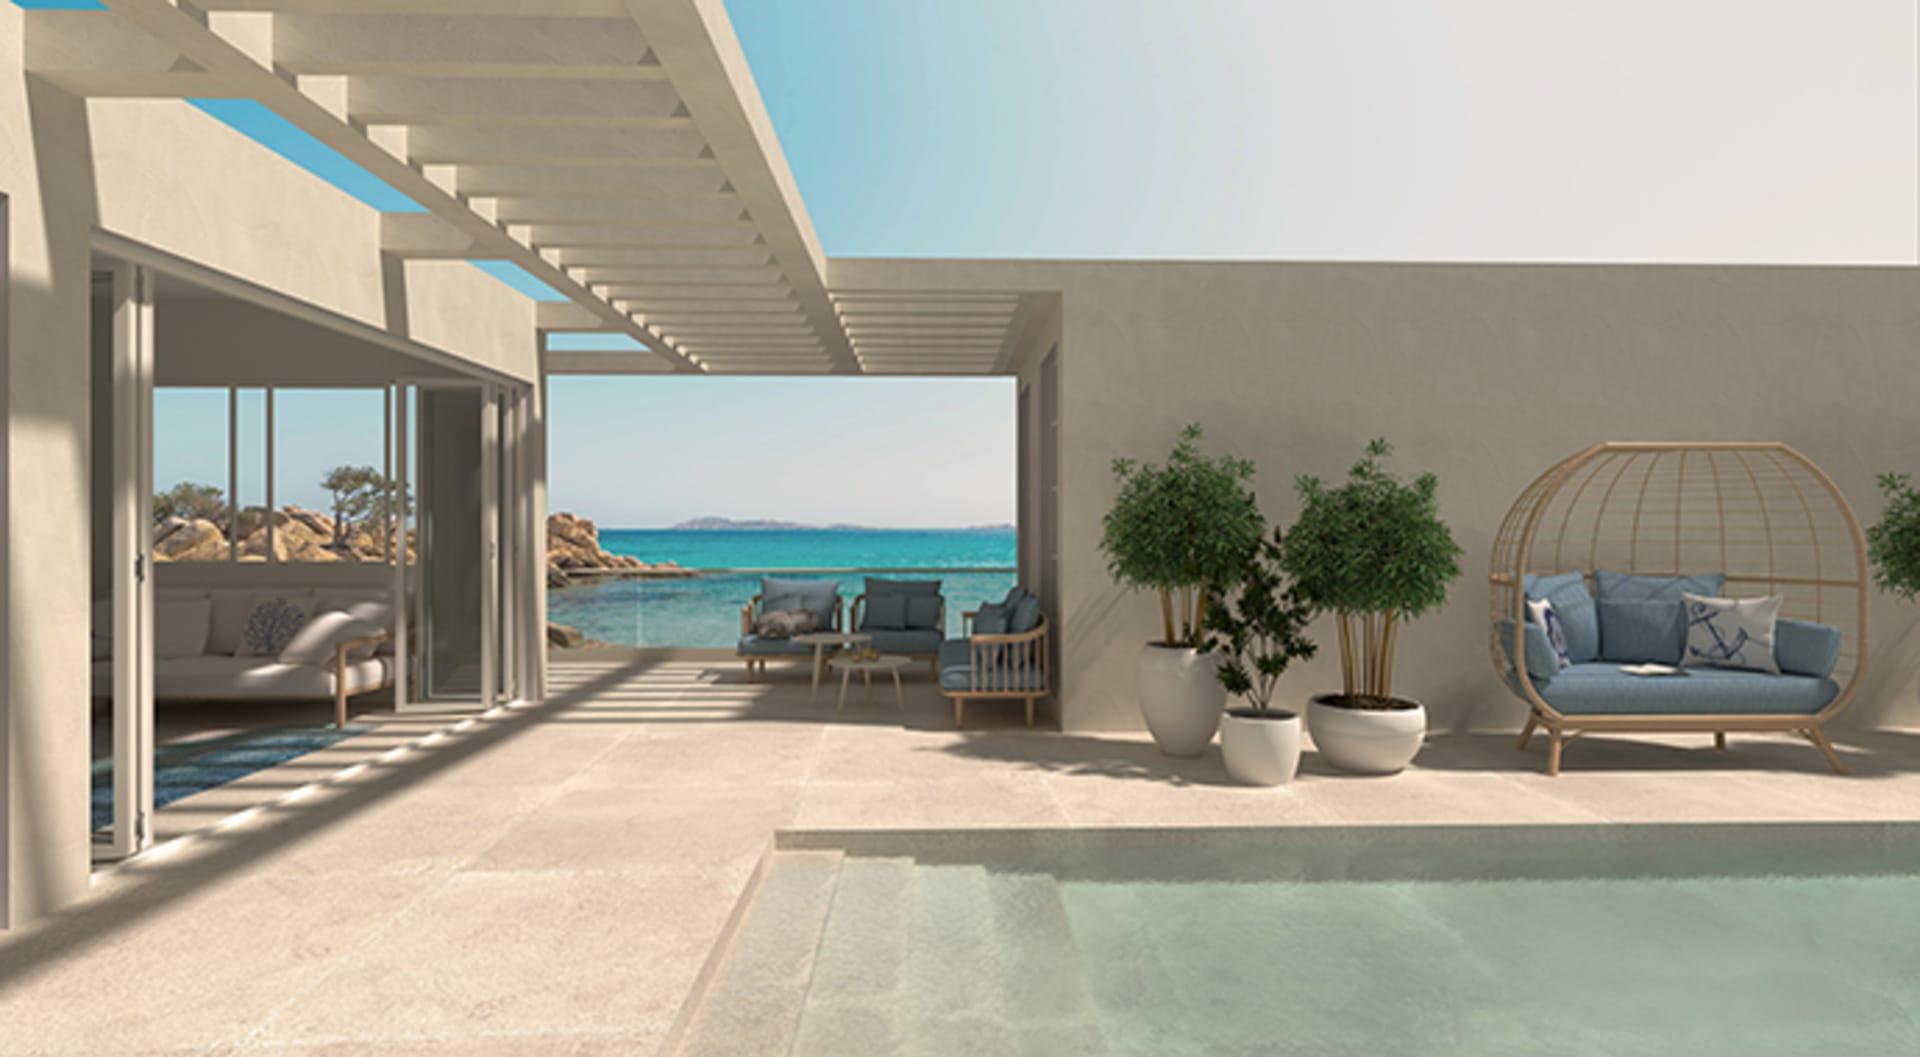 Modern_Sardinia_Villa_with_Swimming_Pool_Rendering_by_DomuS3D-thumb.jpg